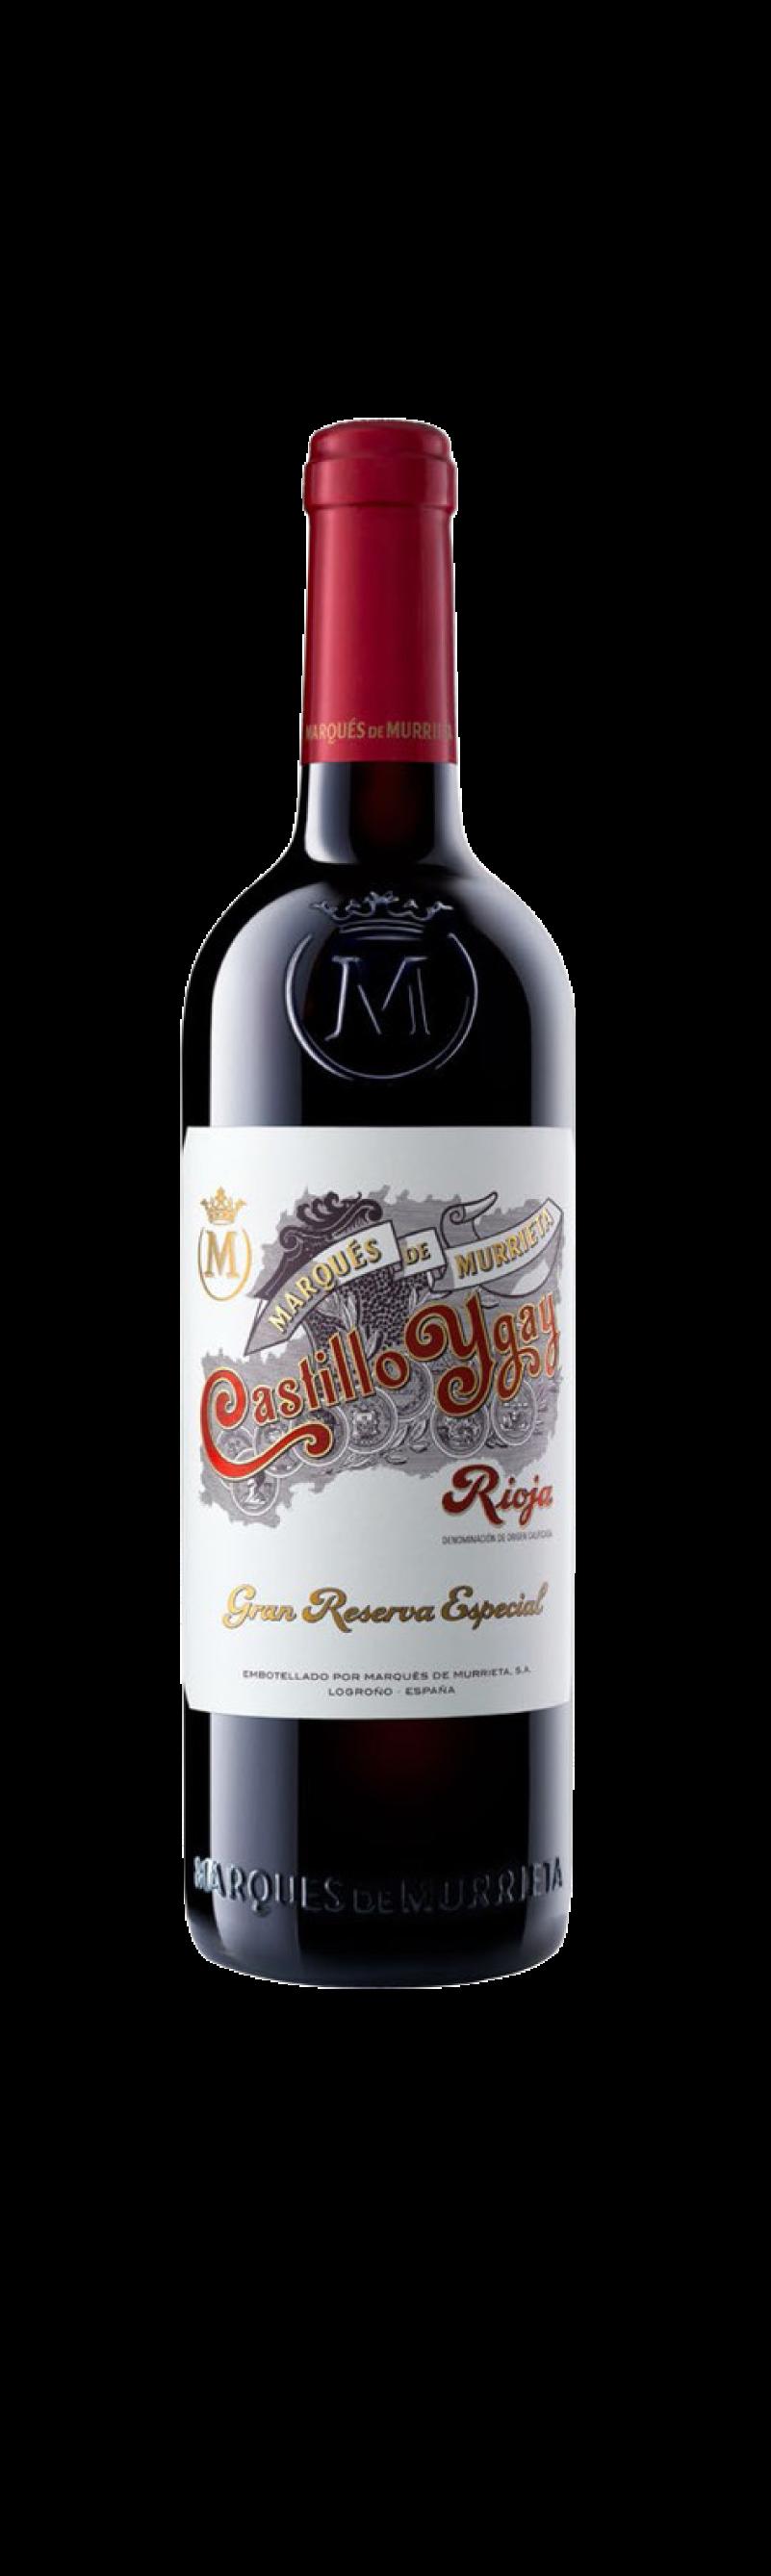 CASTILLO YGAY RIOJA GRAN RESERVA ESPECIAL